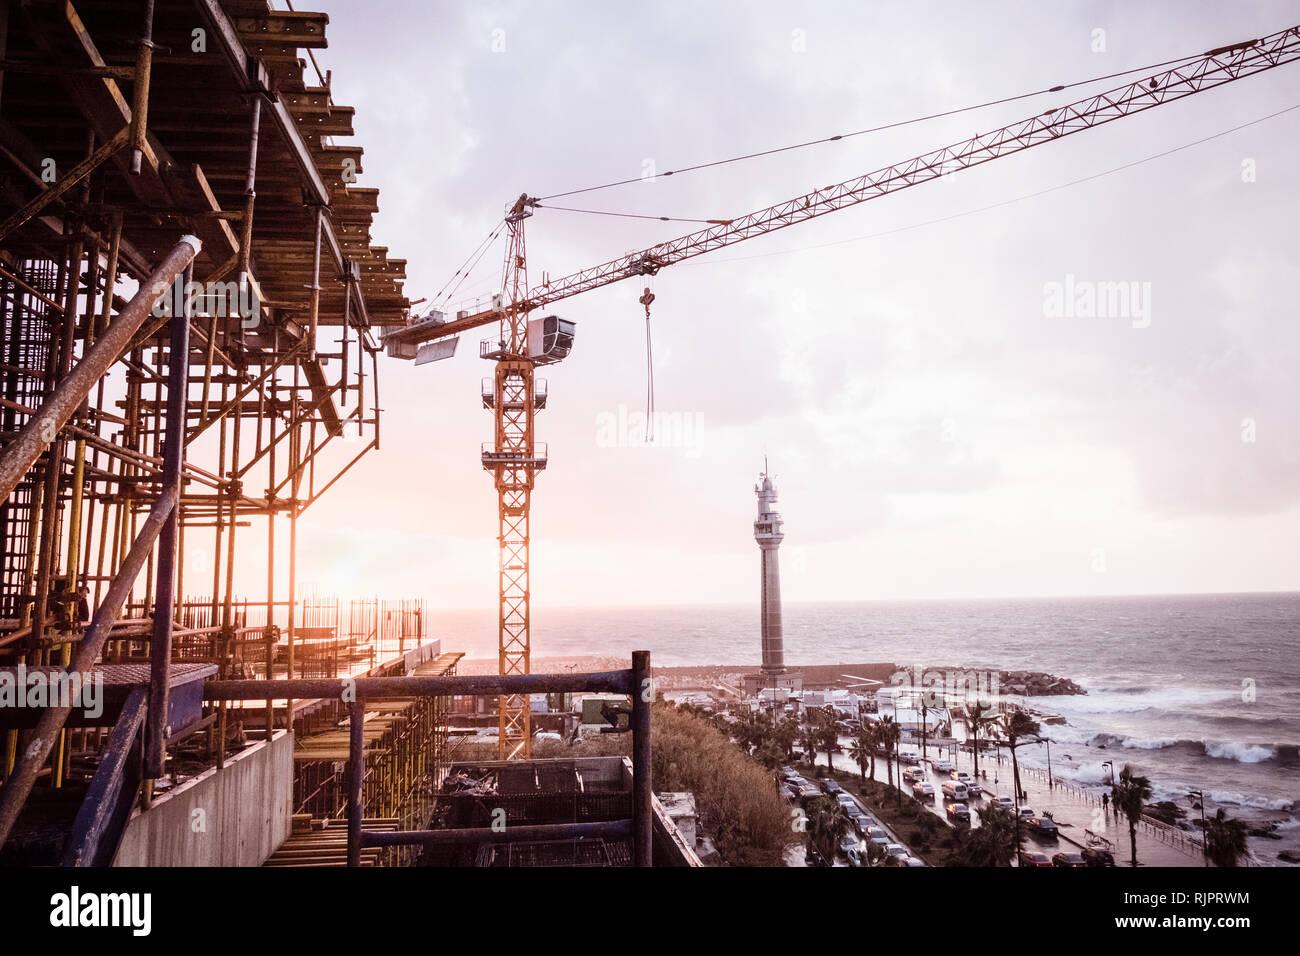 Construction crane on coastal development, Beirut, Lebanon - Stock Image